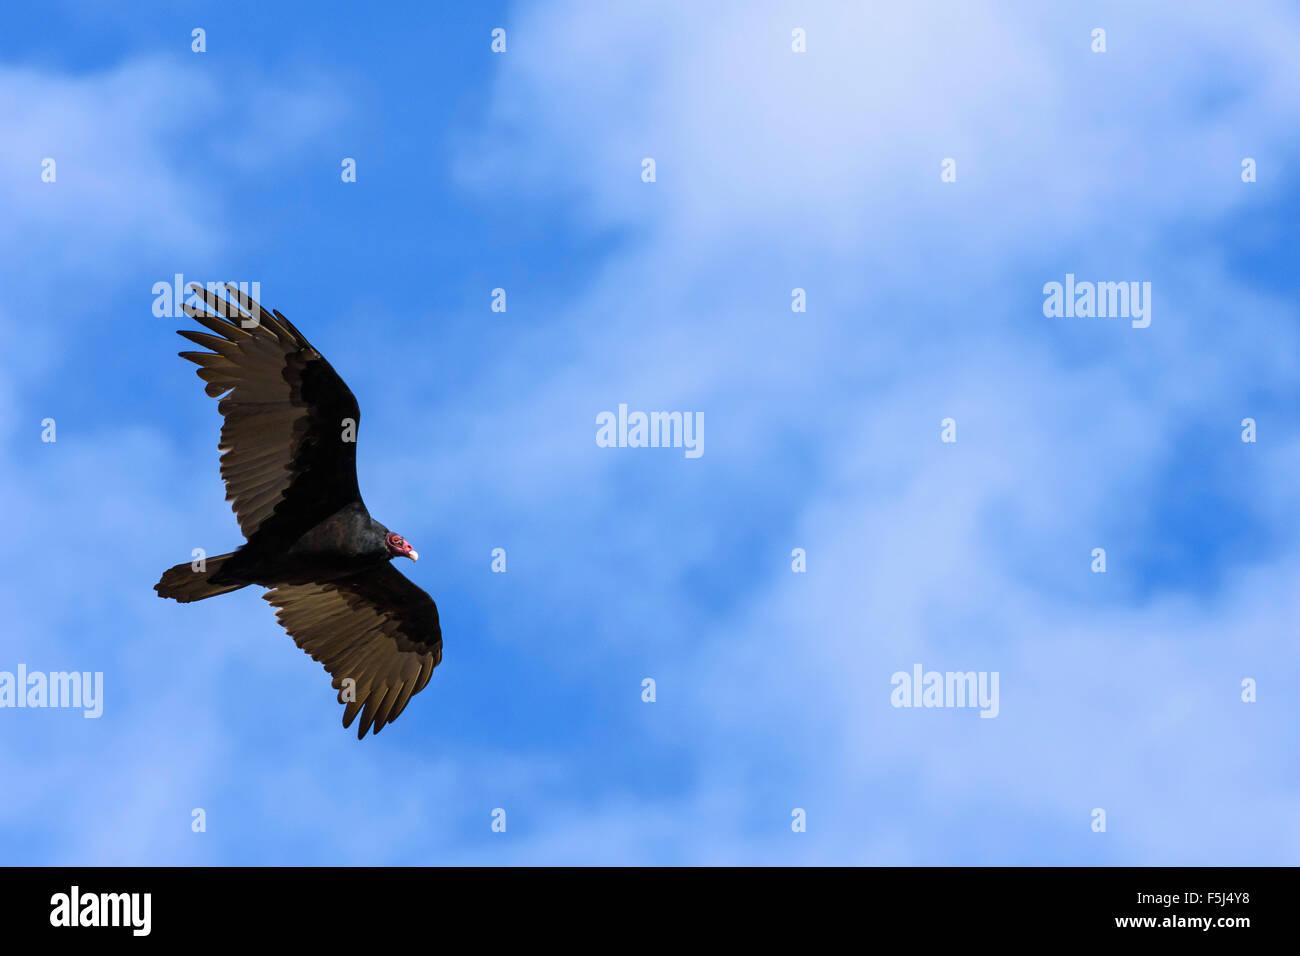 Turkey Vulture, Cathartes aura, Grand Tetons National Park, Wyoming, USA - Stock Image